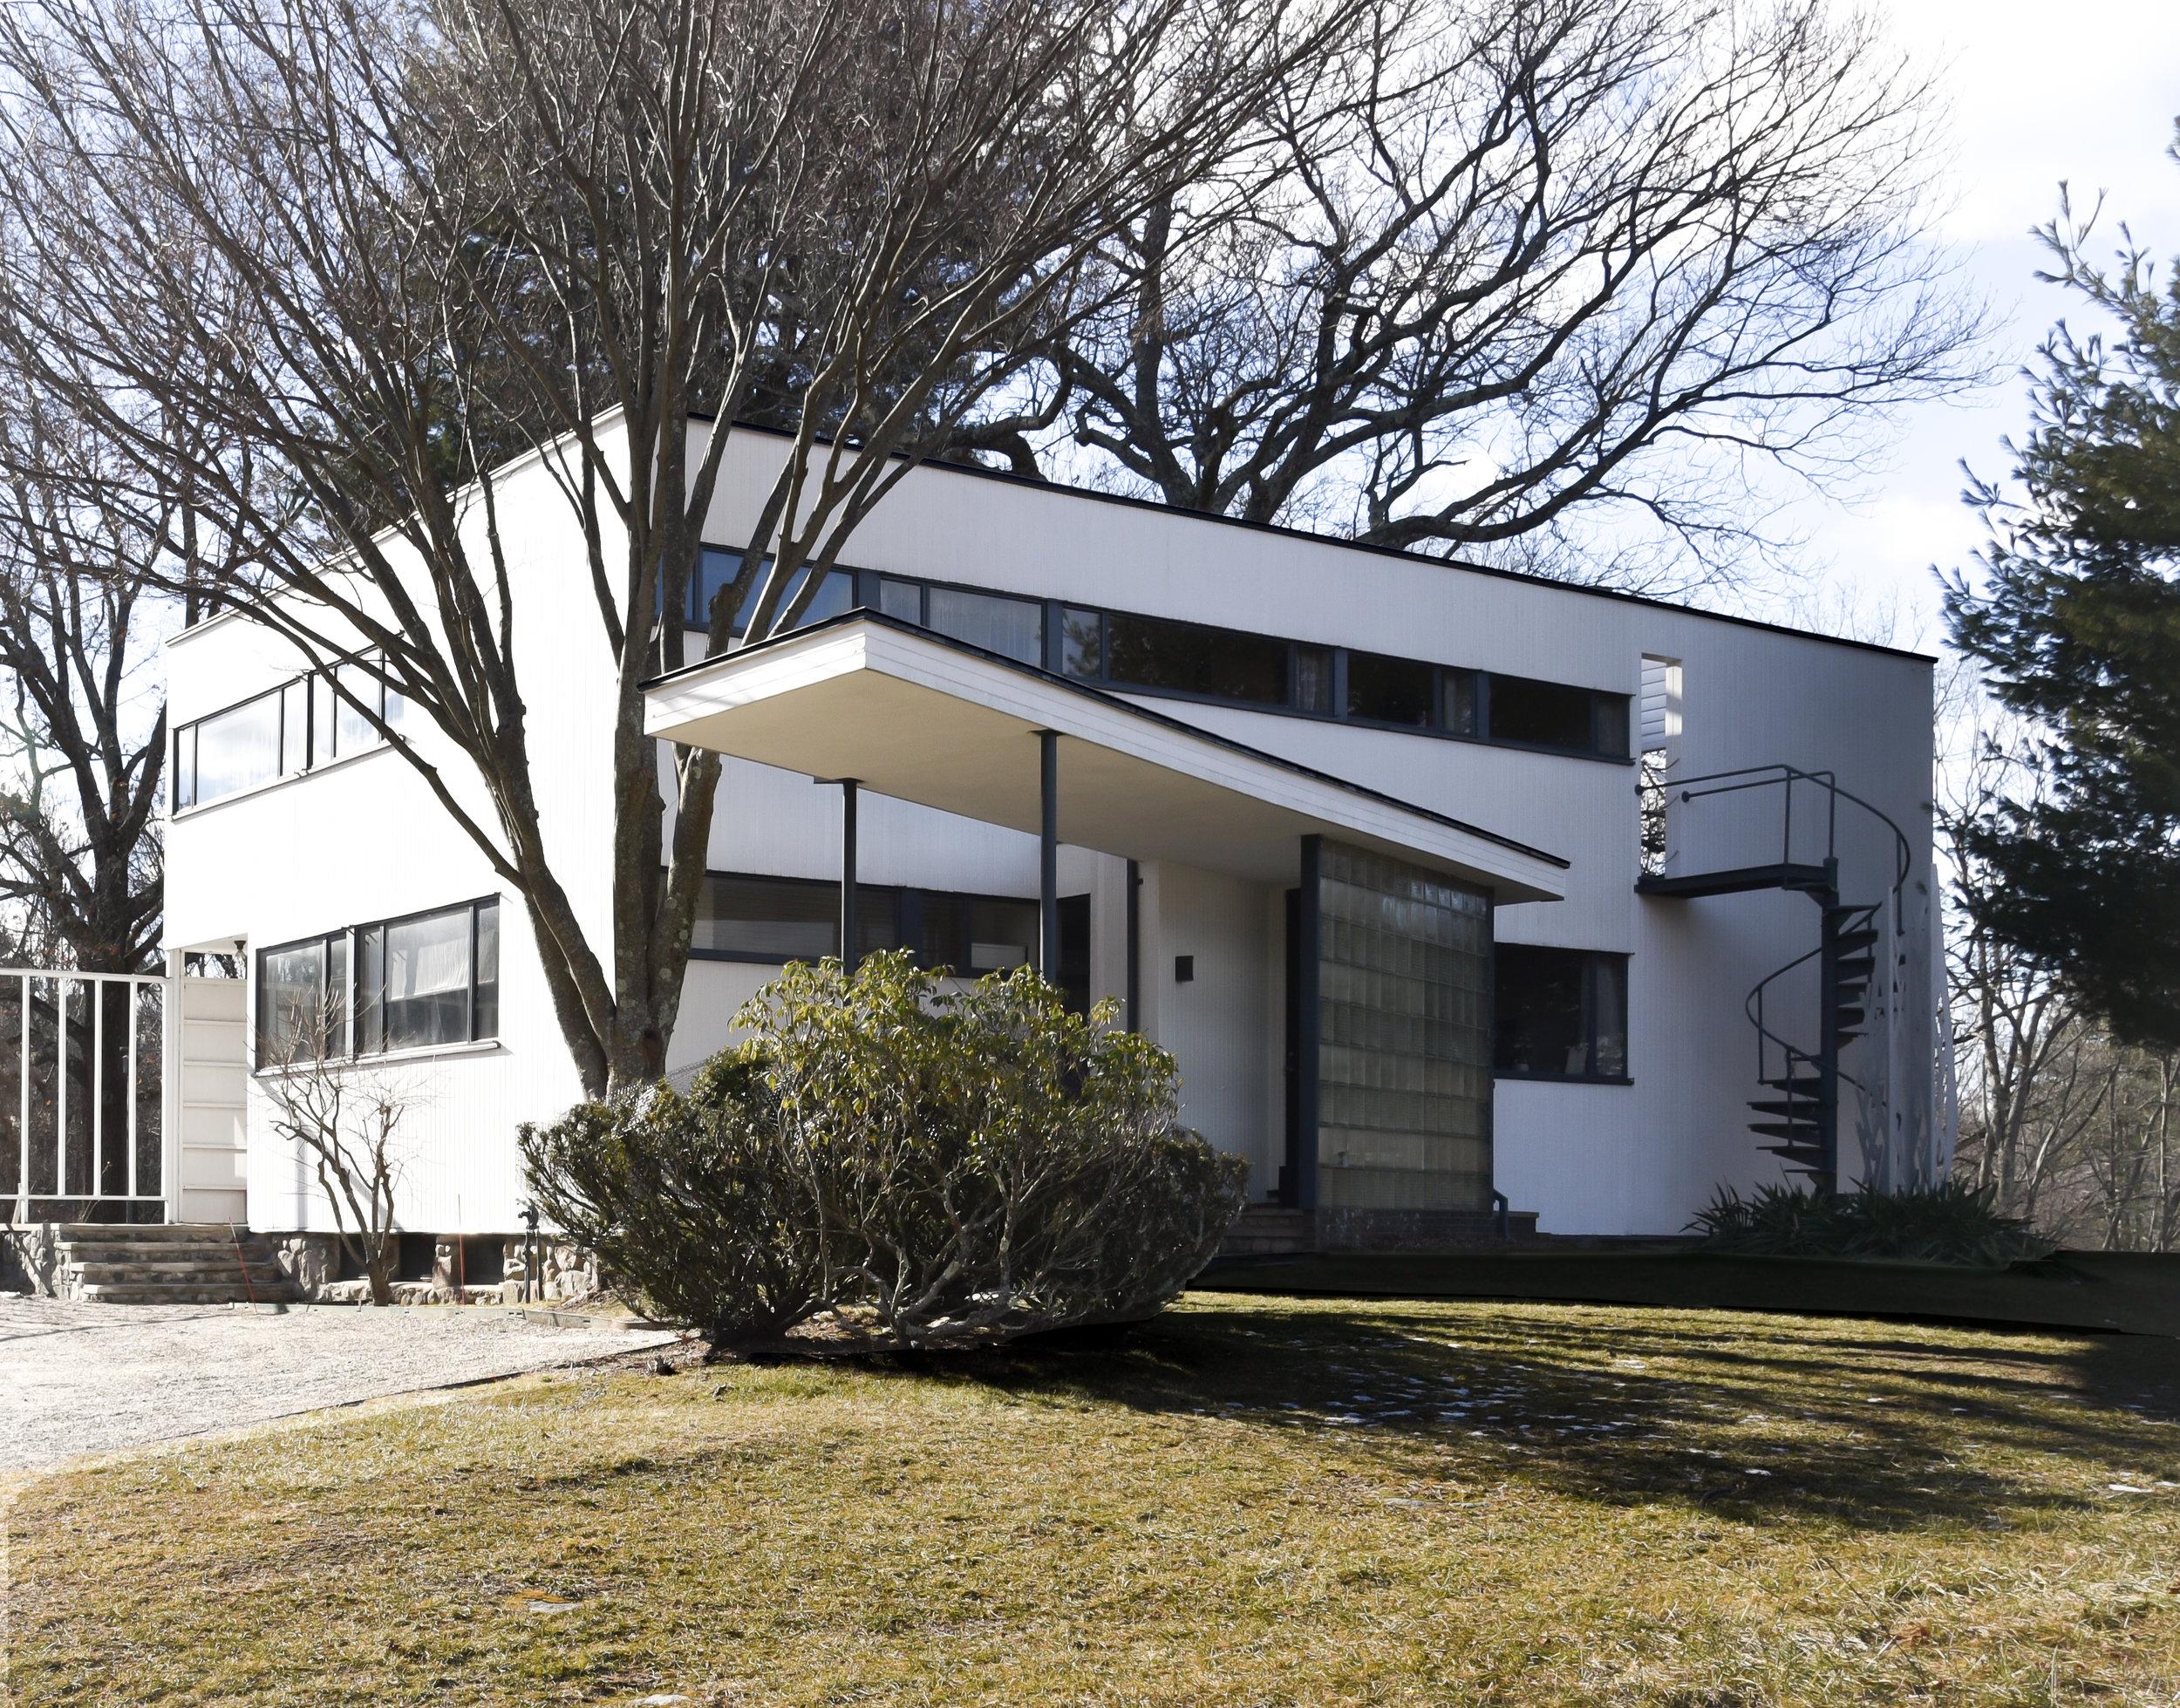 Gropius house entrance